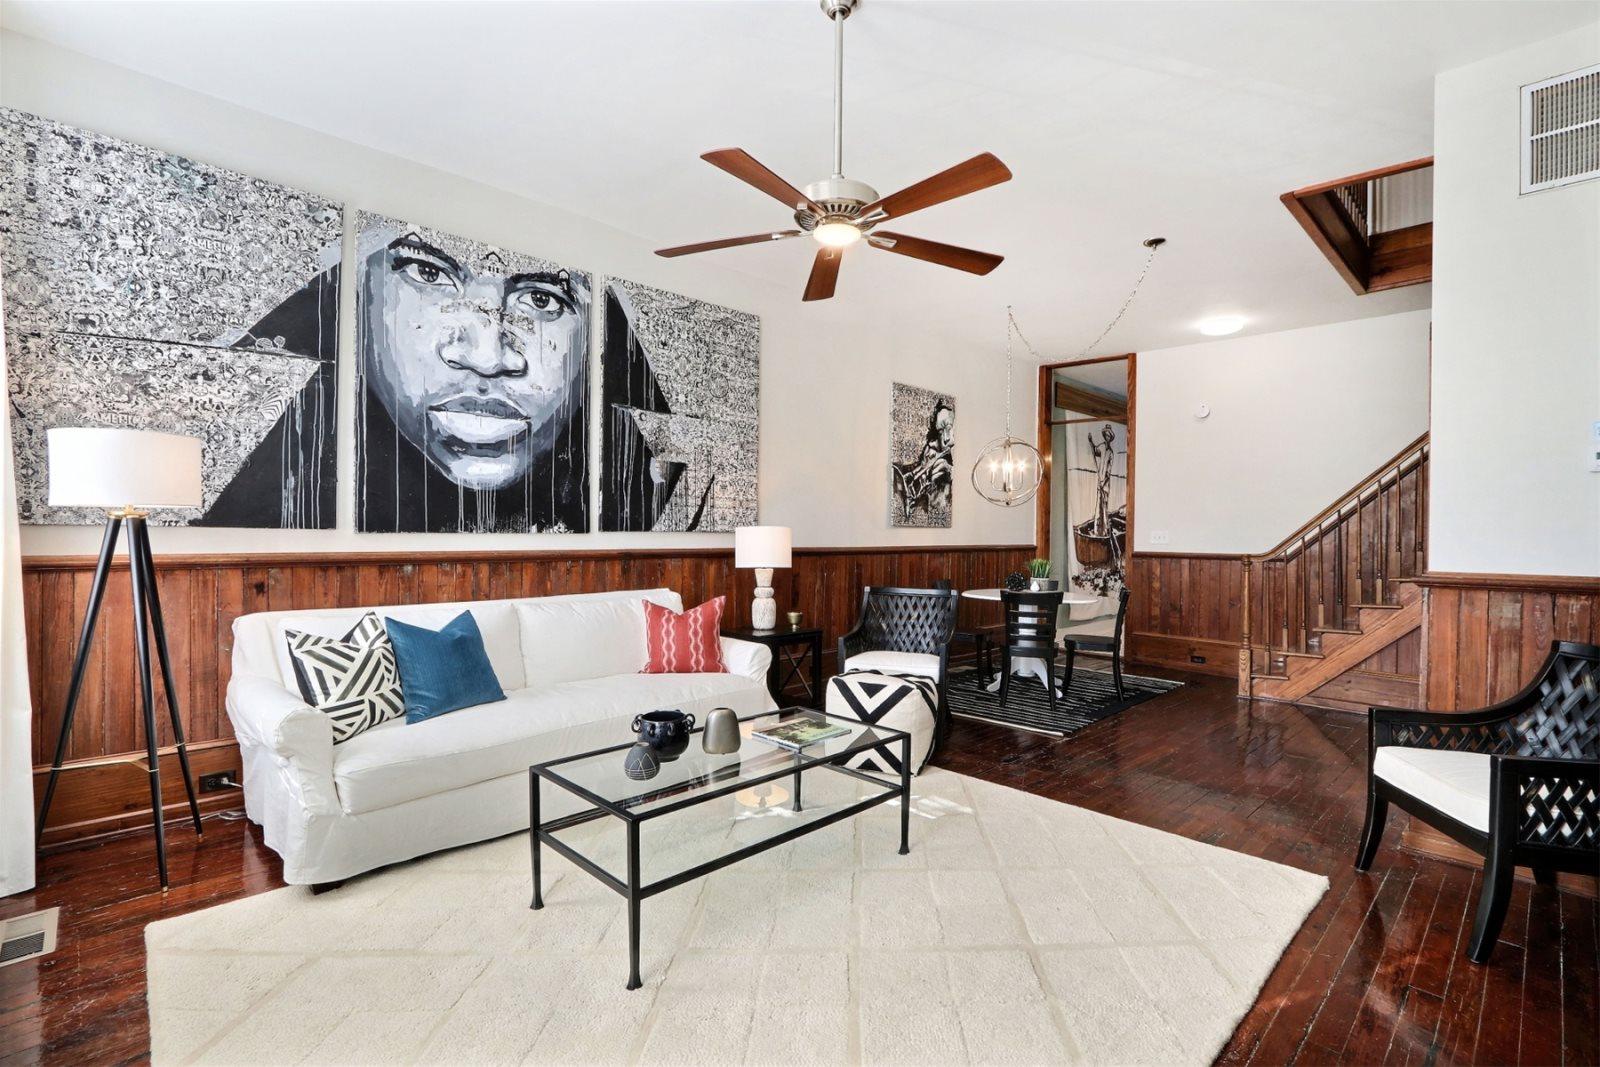 Vacation Rentals Savannah Ga >> Gallery Stays Luxury Vacation Rentals